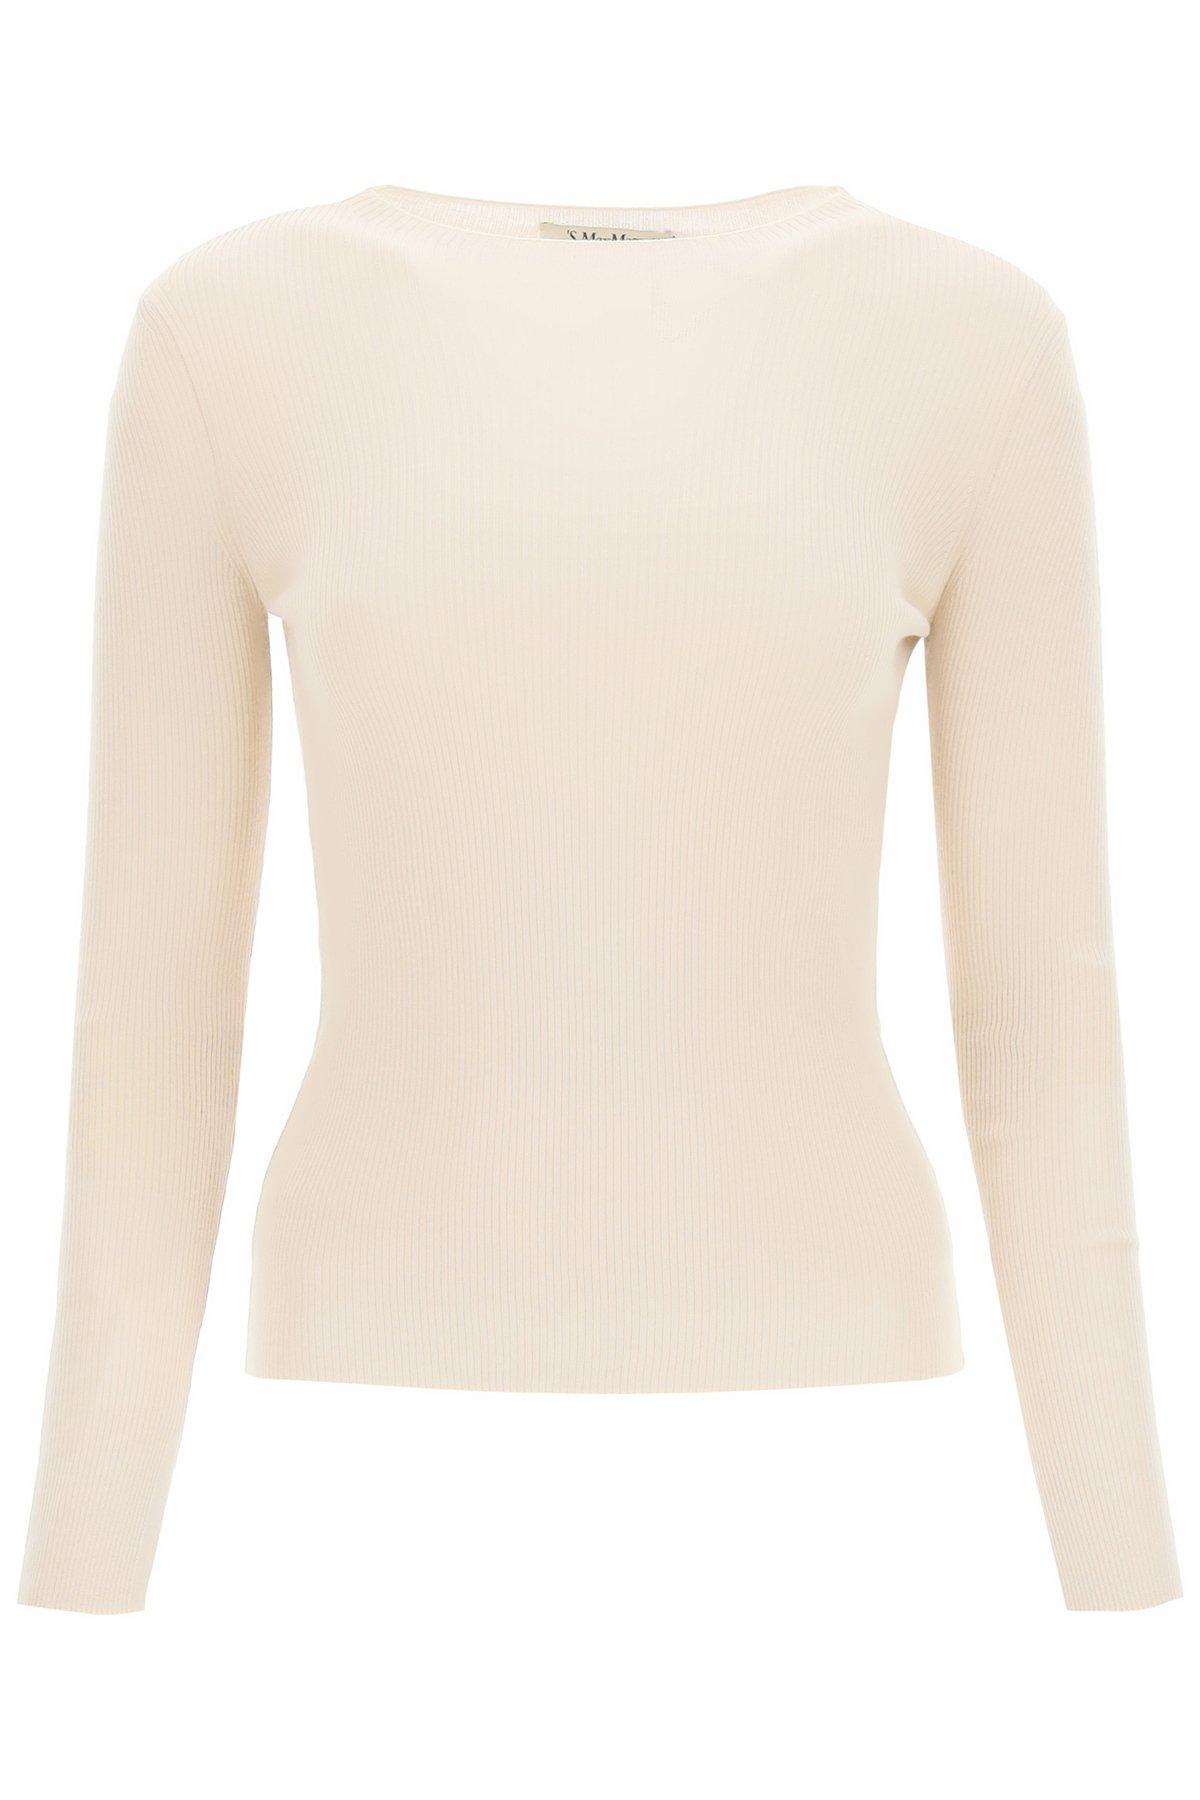 's max mara maglia in lana vergine